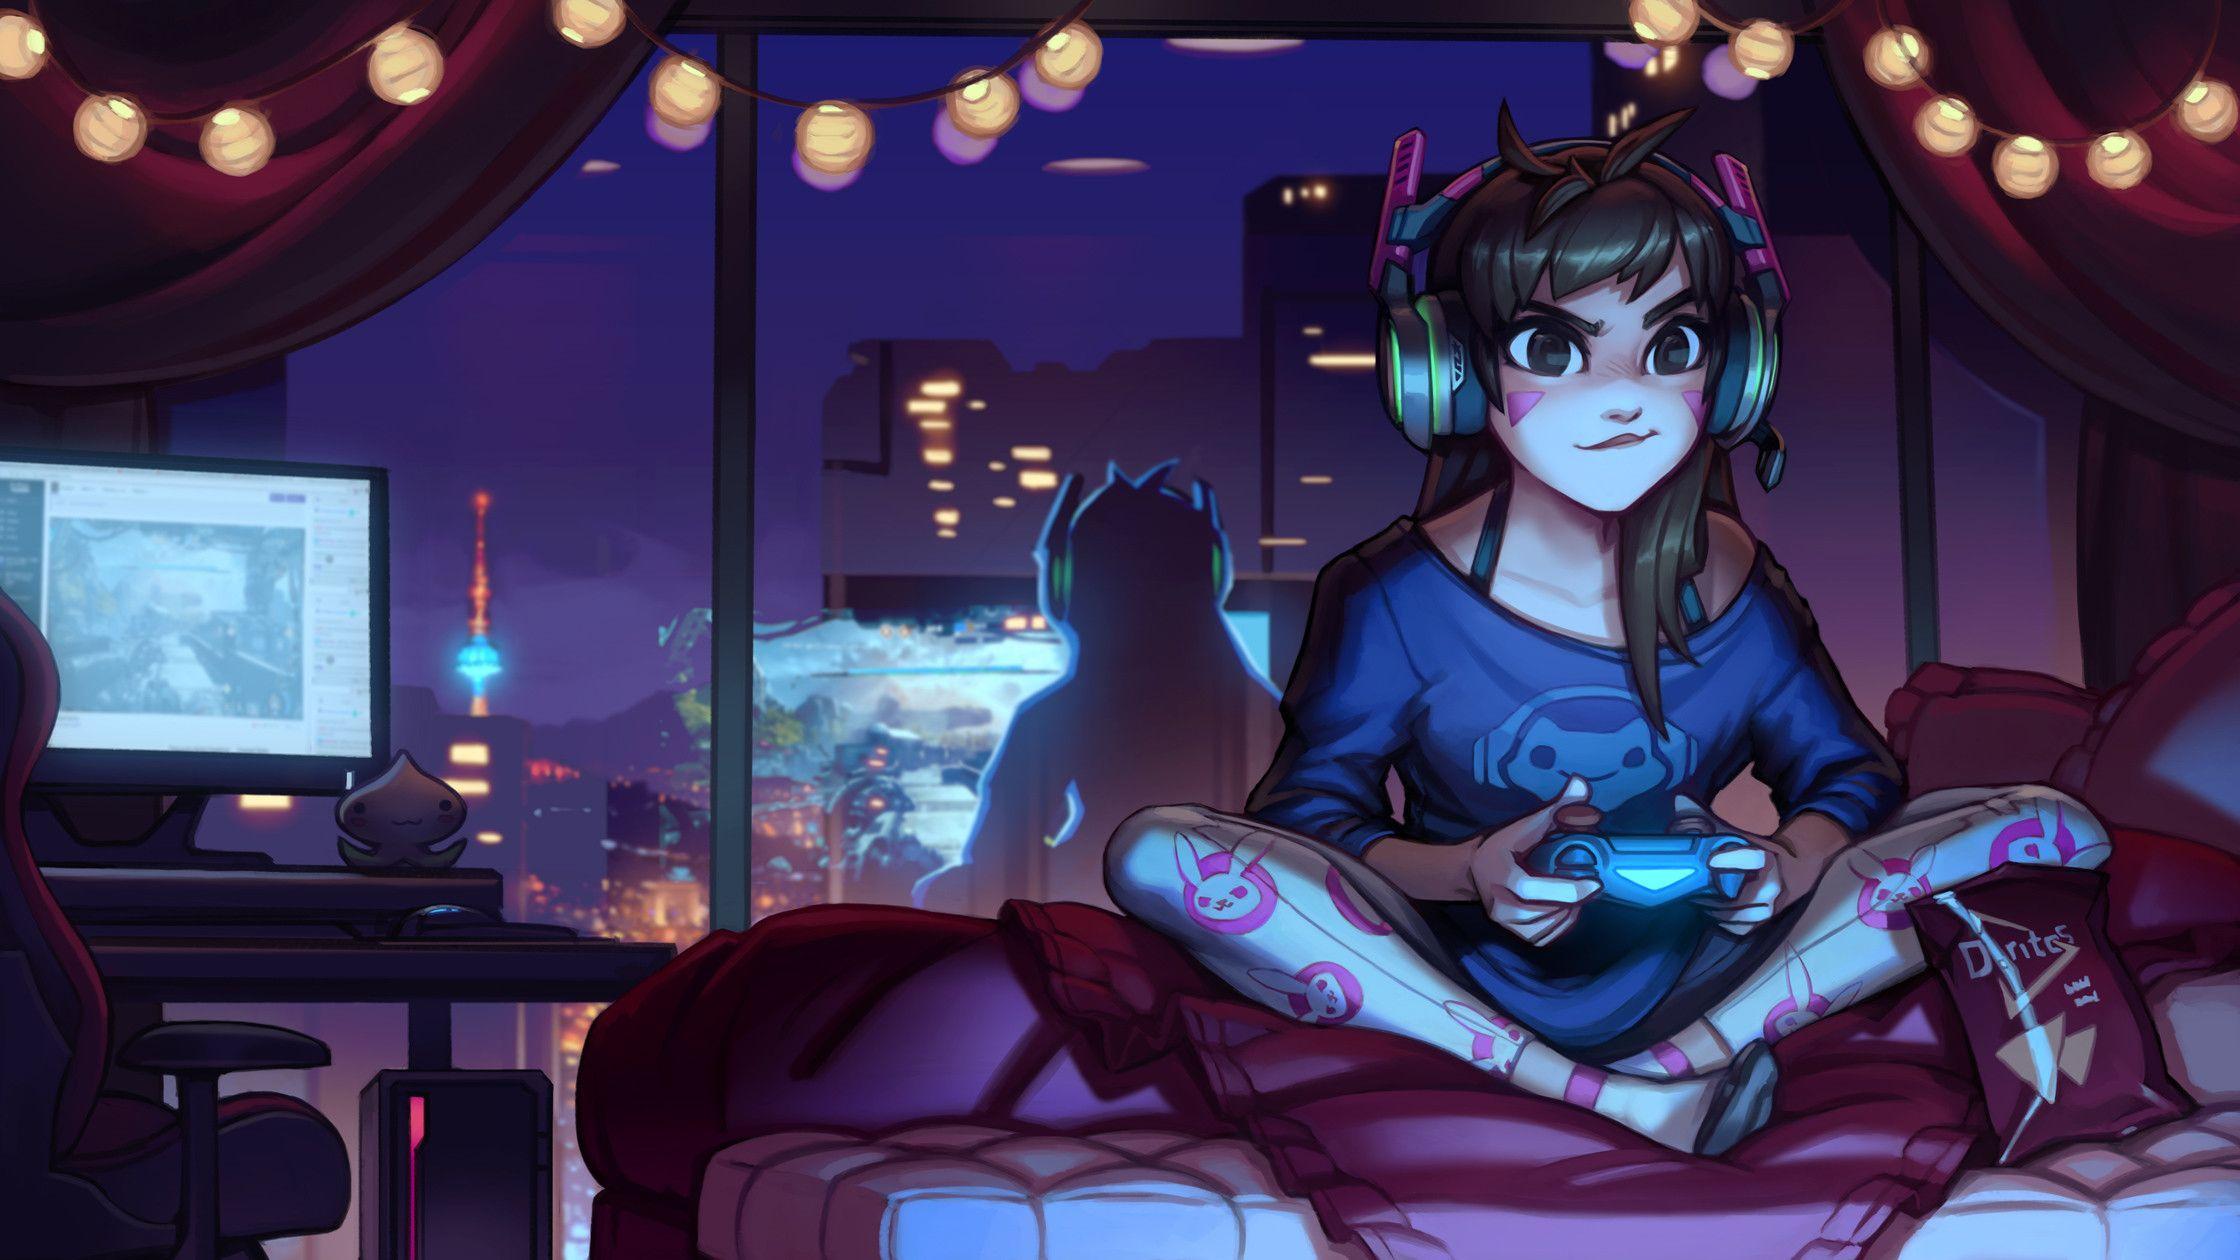 Gaming Anime Girl Wallpapers - Top Free Gaming Anime Girl